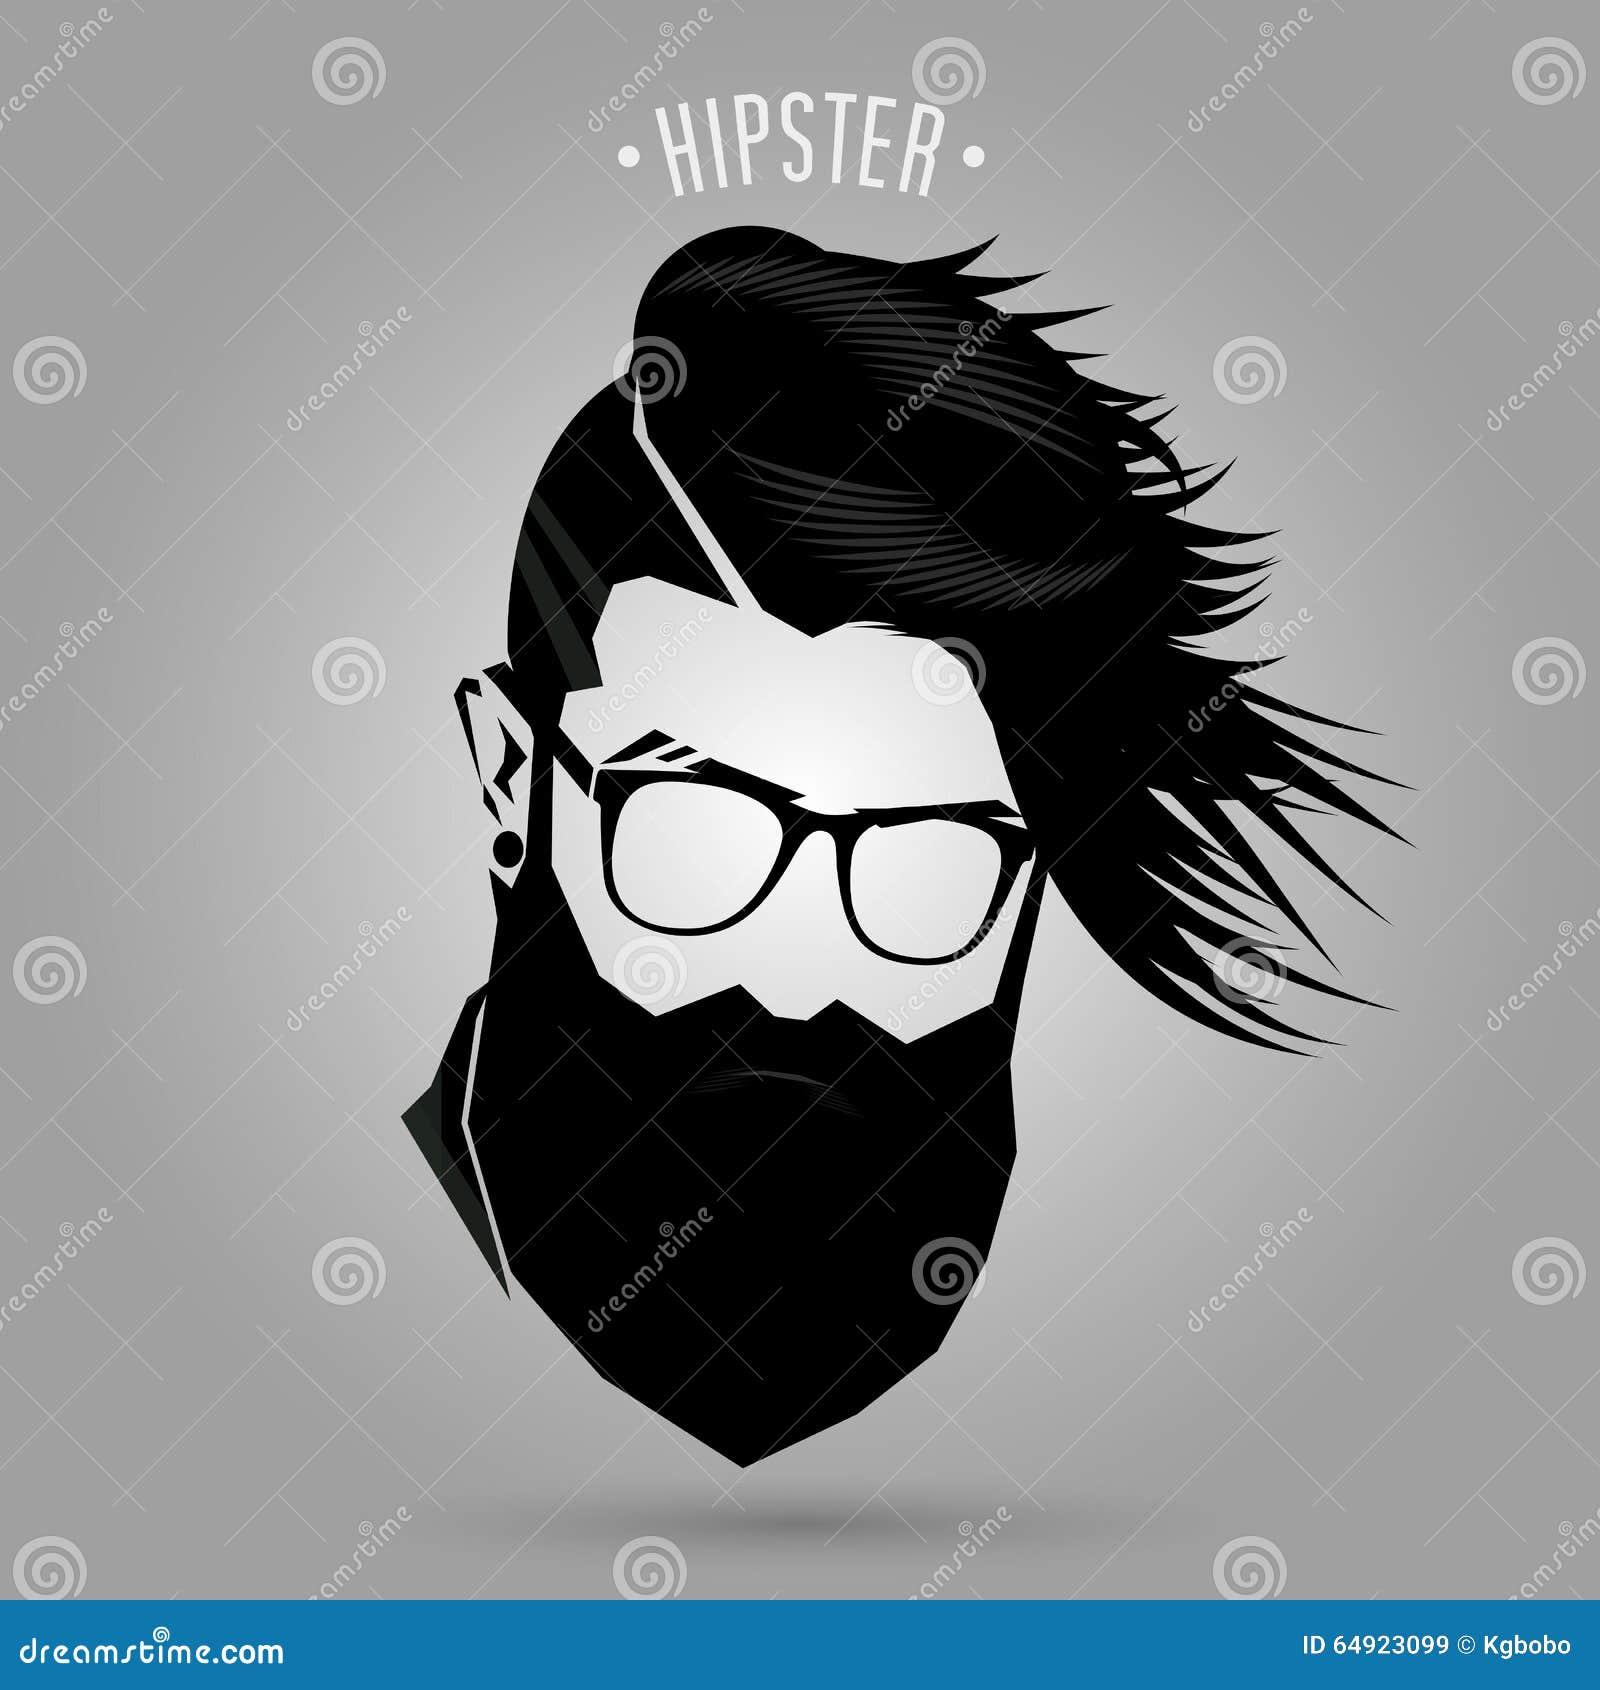 Hipster Men Fashion Sign Stock Vector Illustration Of Hair 64923099